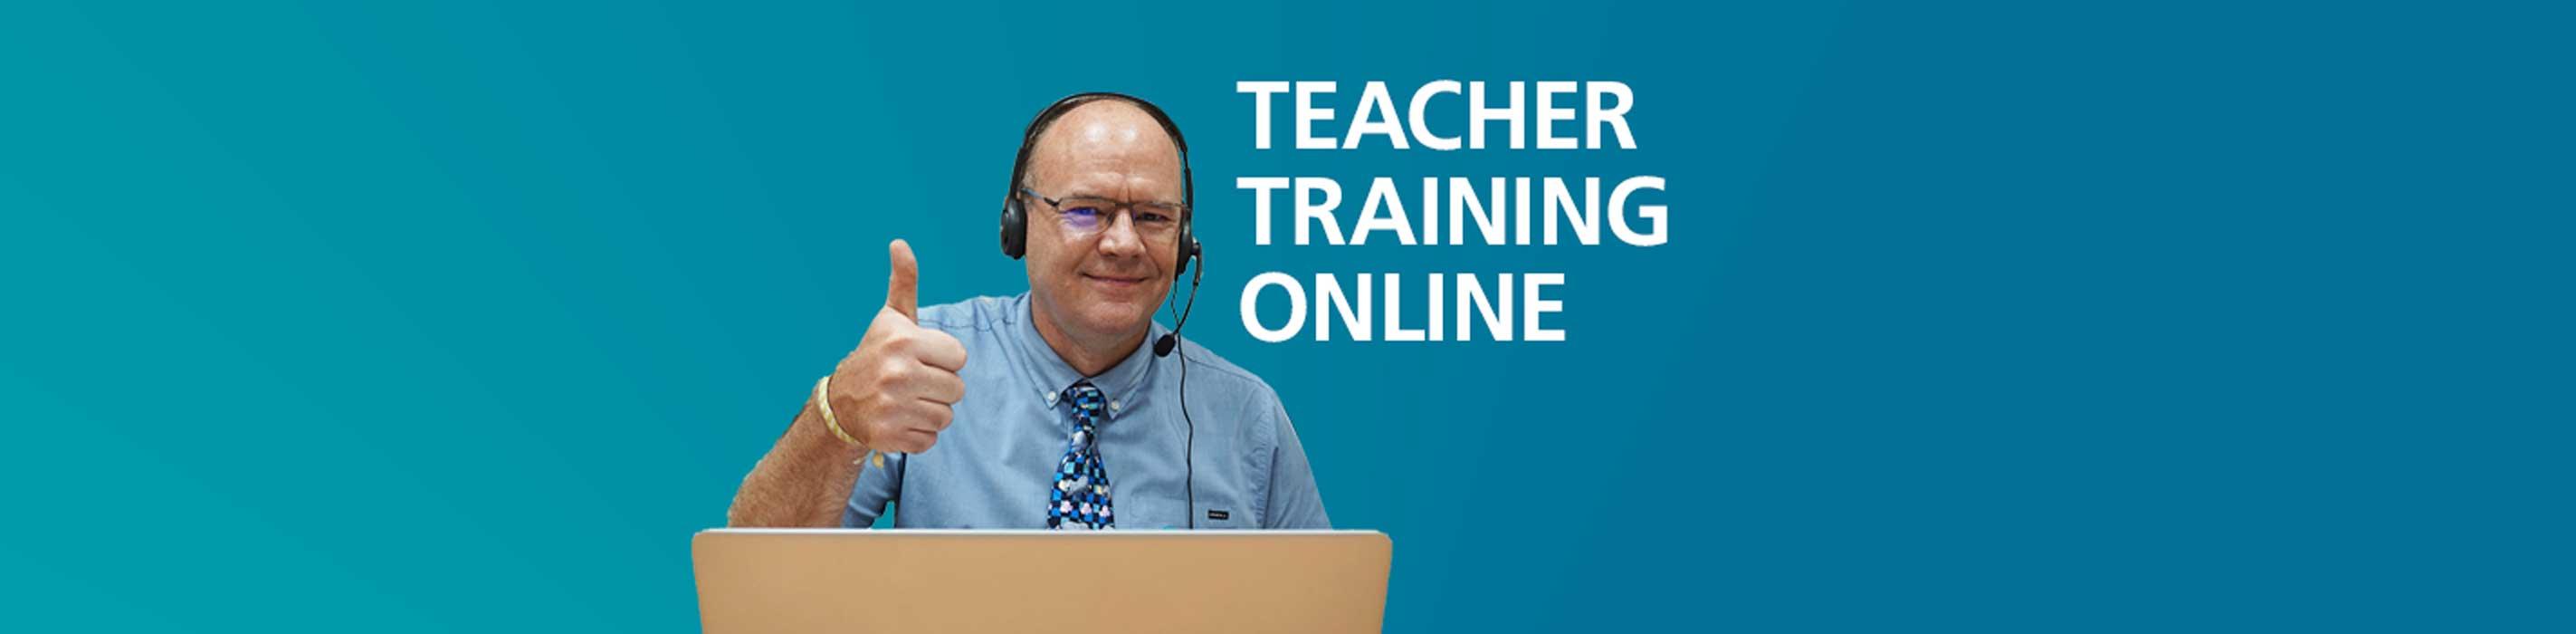 Teacher Training Online